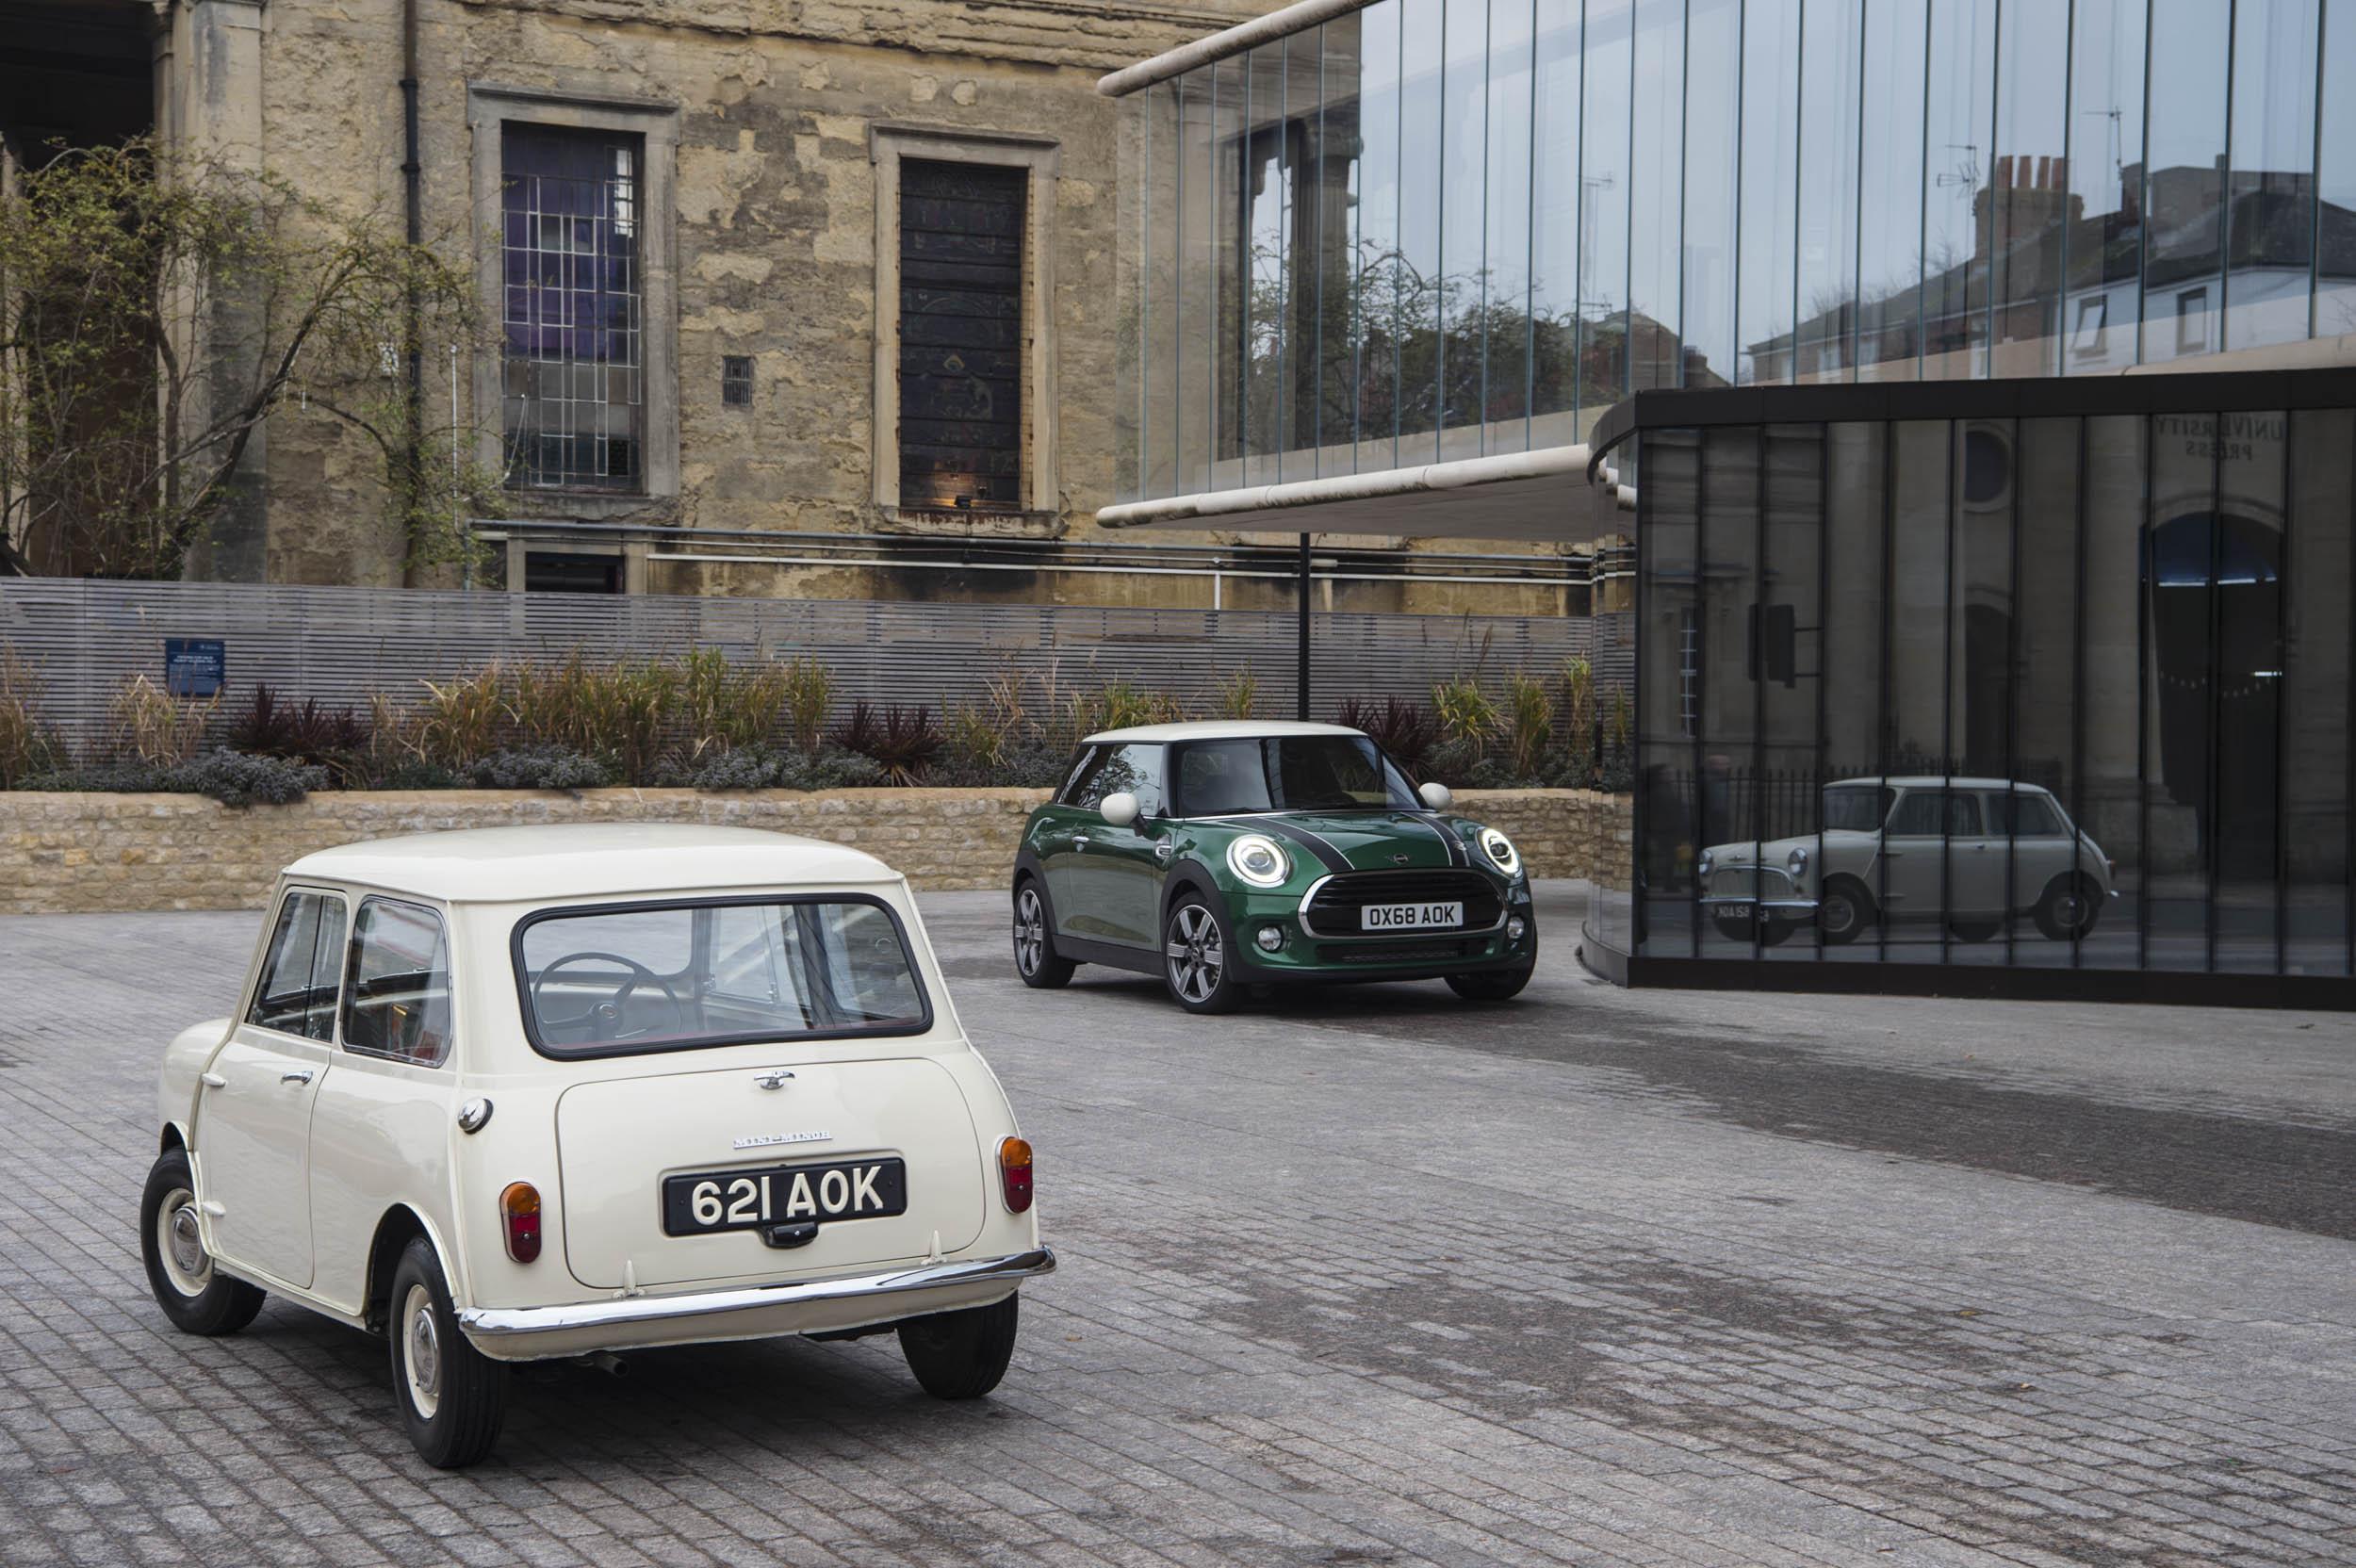 1959 Morris Mini-Minor with 60th anniversary Mini Cooper front and rear